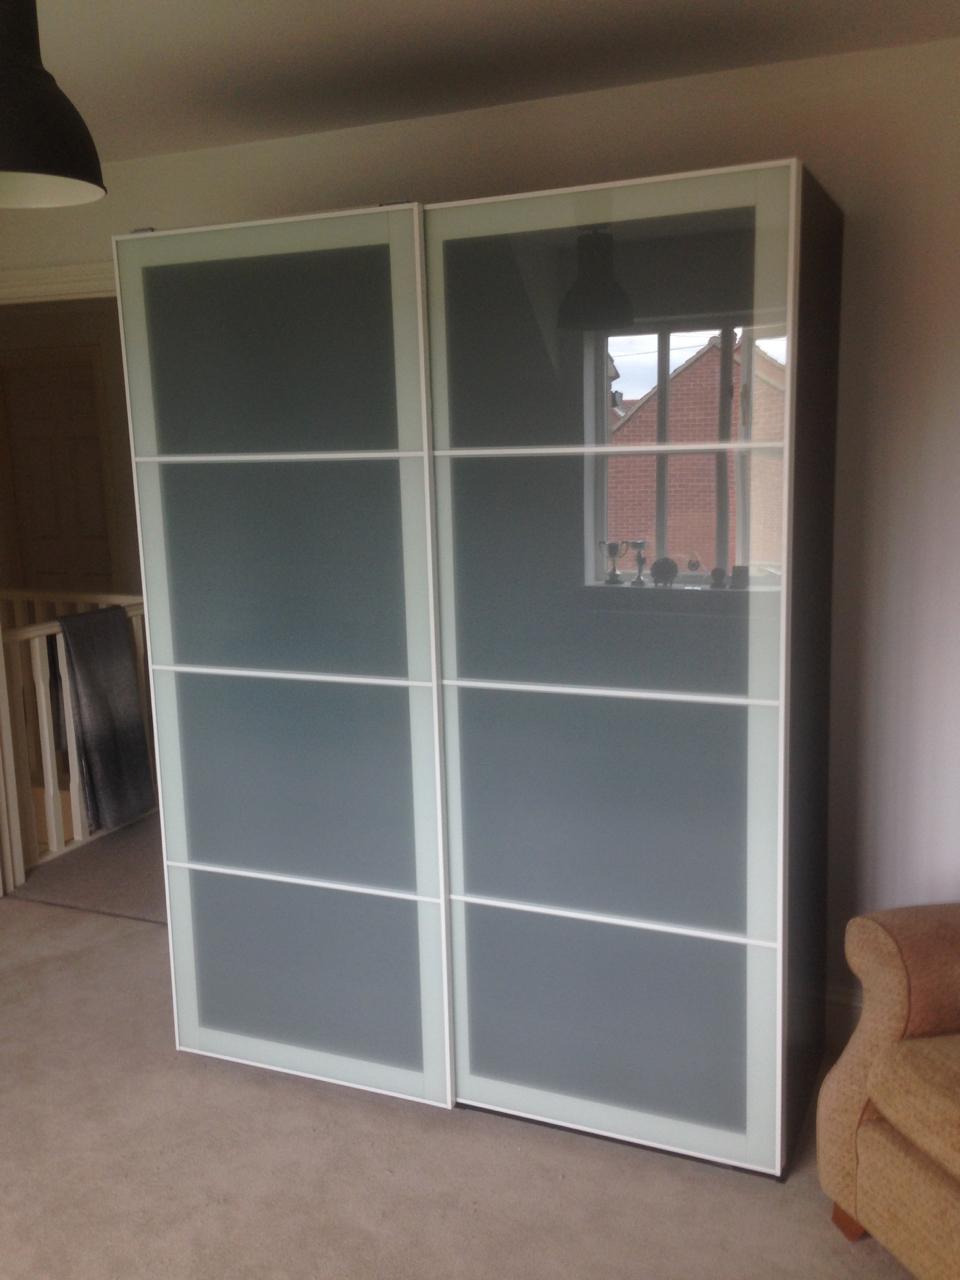 Ikea PAX sliding frosted glass Sekken wardrobes assembled by www.norwichflatpack.co.uk